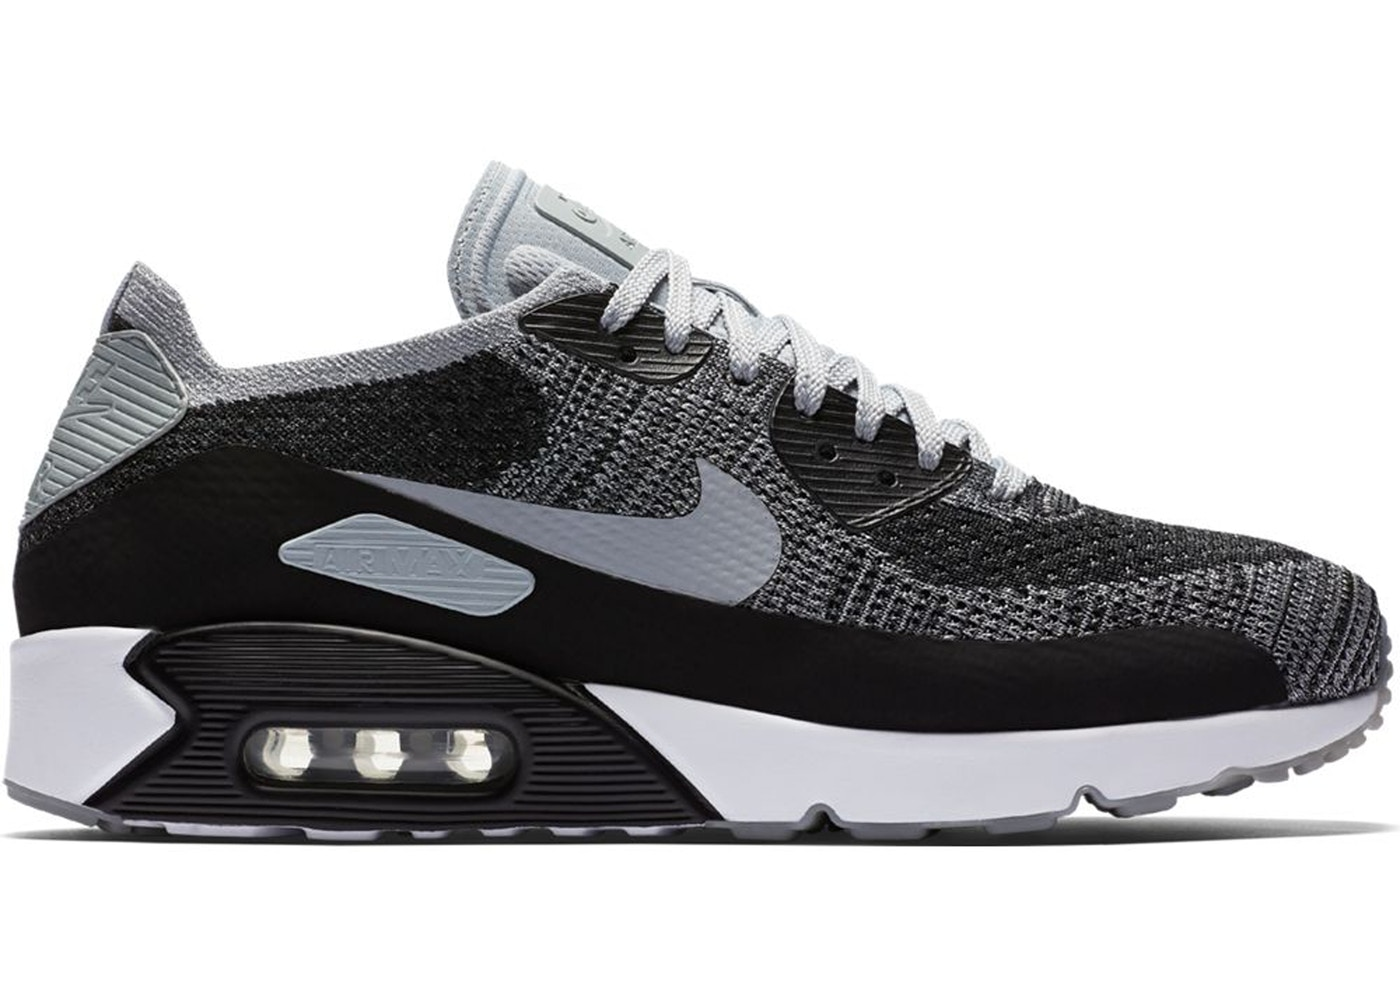 pegamento curva Retorcido  Nike Air Max 90 Ultra 2.0 Flyknit Black Wolf Grey - 875943-005